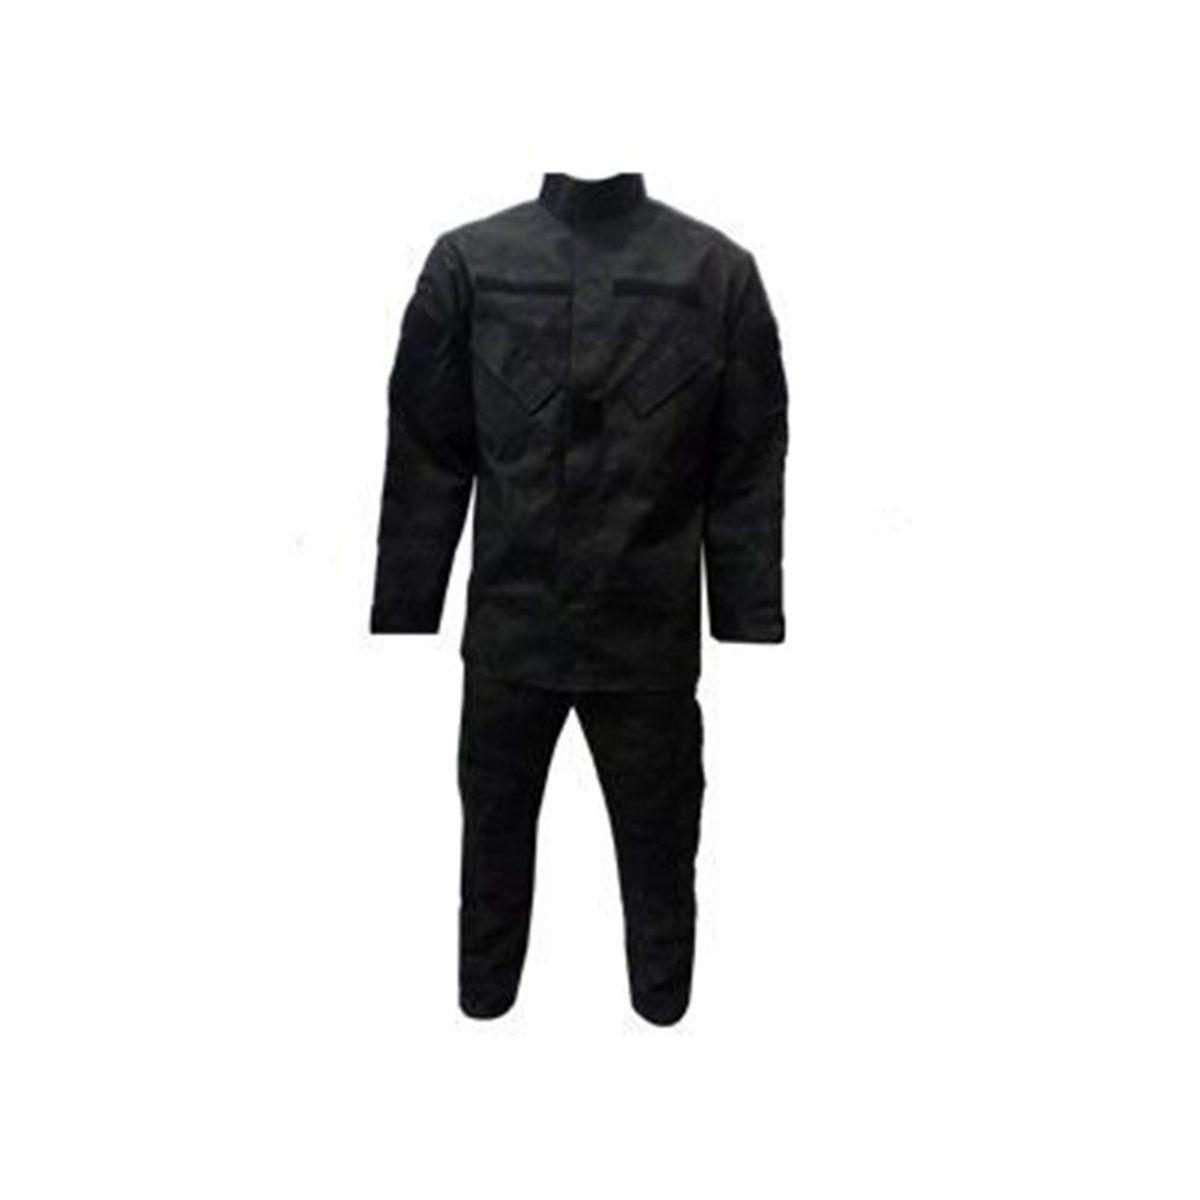 Conjunto Gandola + calça Ripstop Multicam Black - Uai Fardas